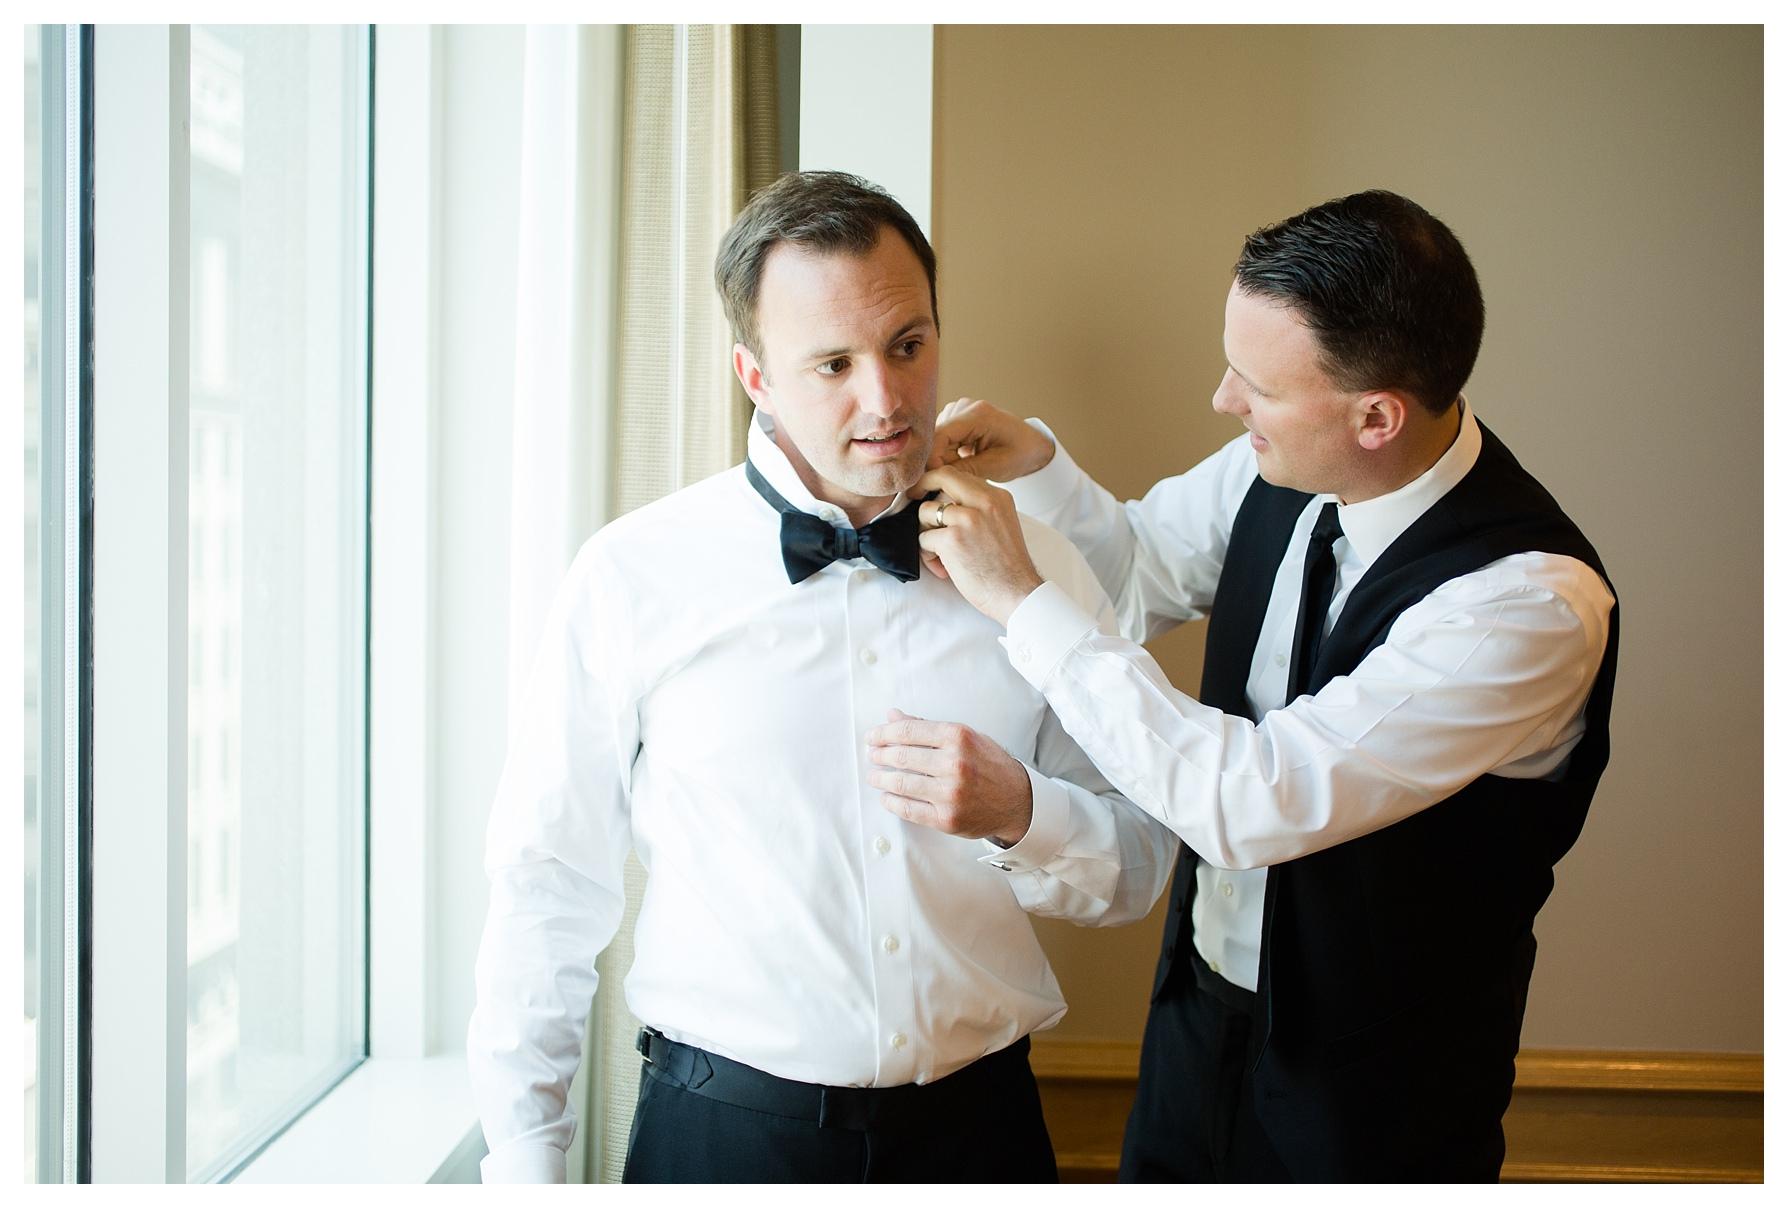 ritz-carlton-cleveland-wedding_0098.jpg